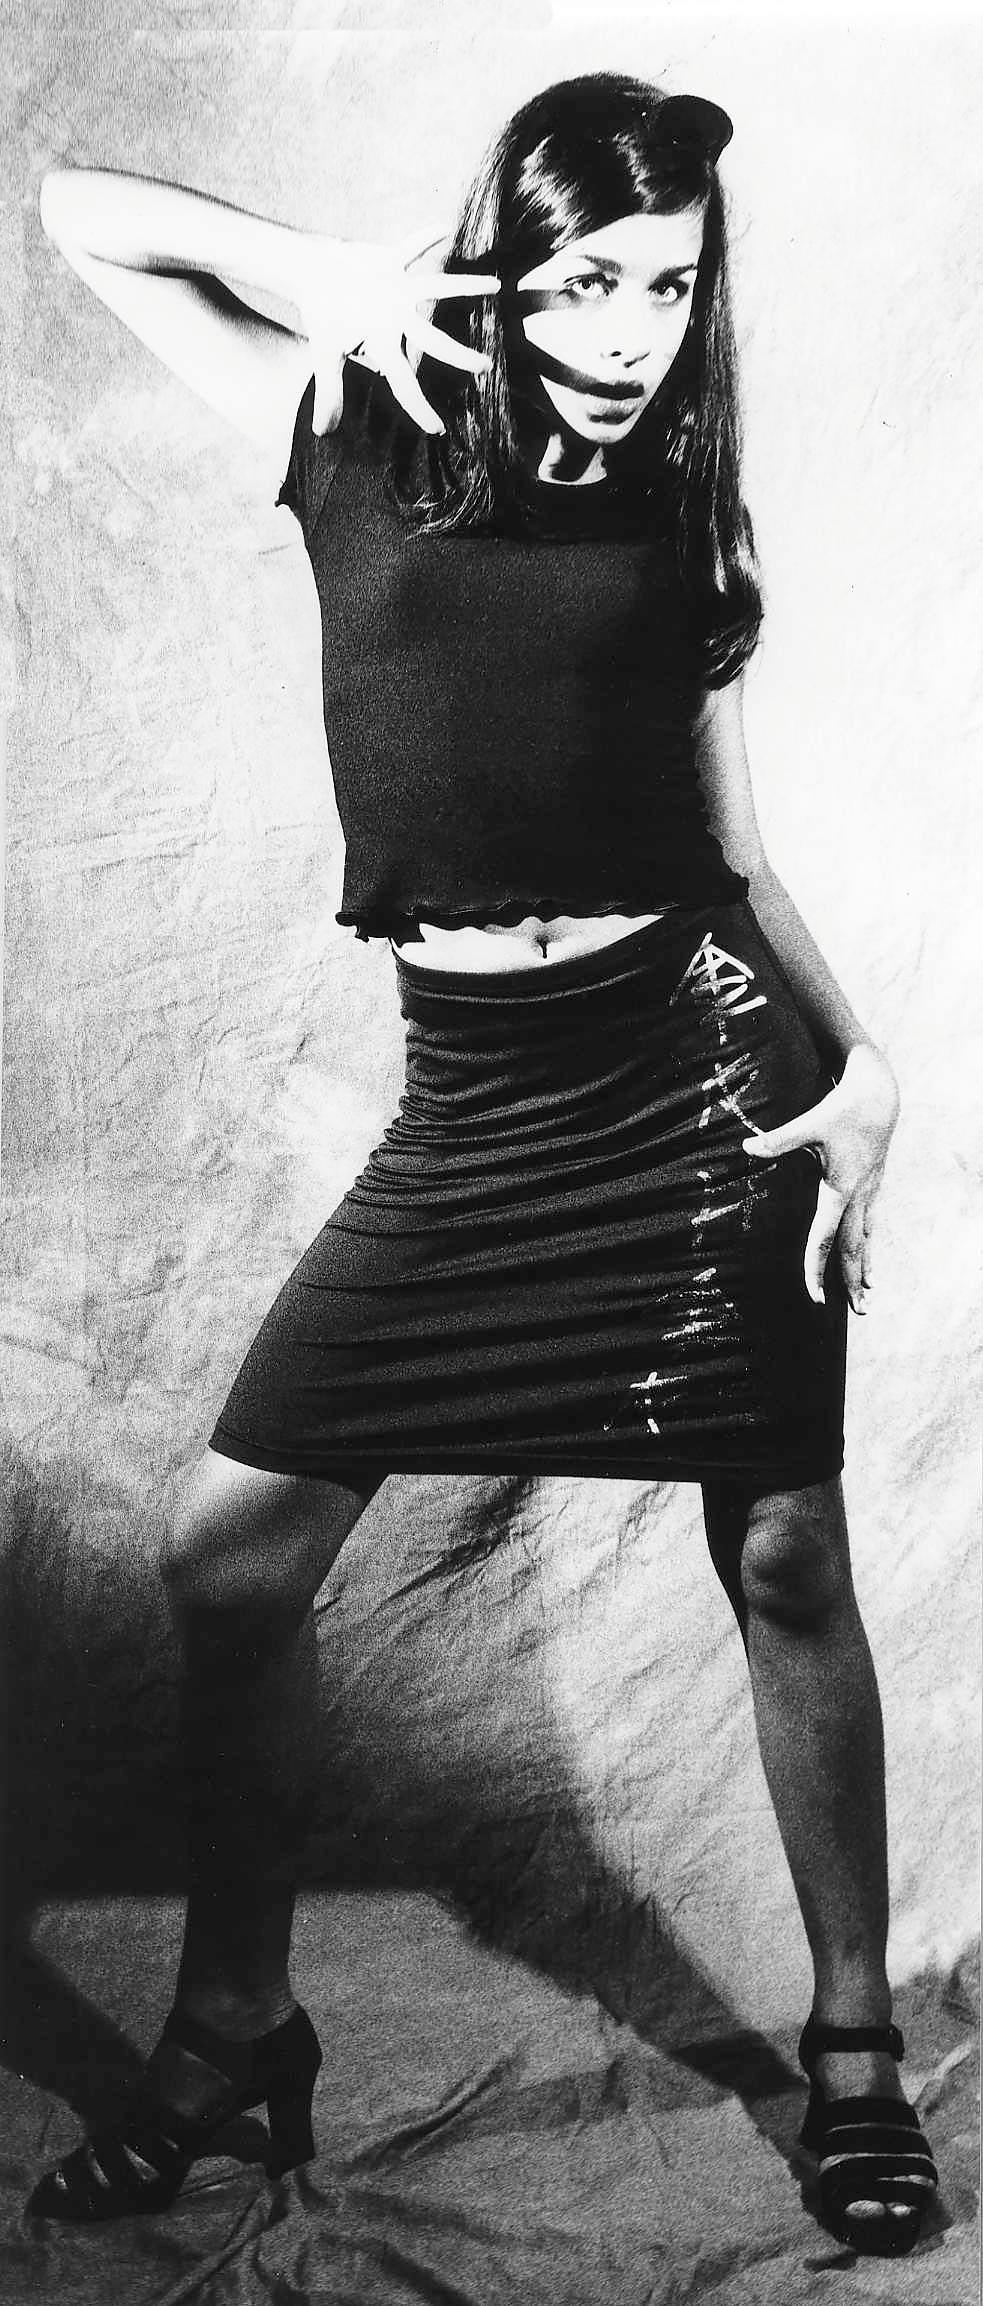 Fashion Portrait - model Lana  - michaelfinder | ello